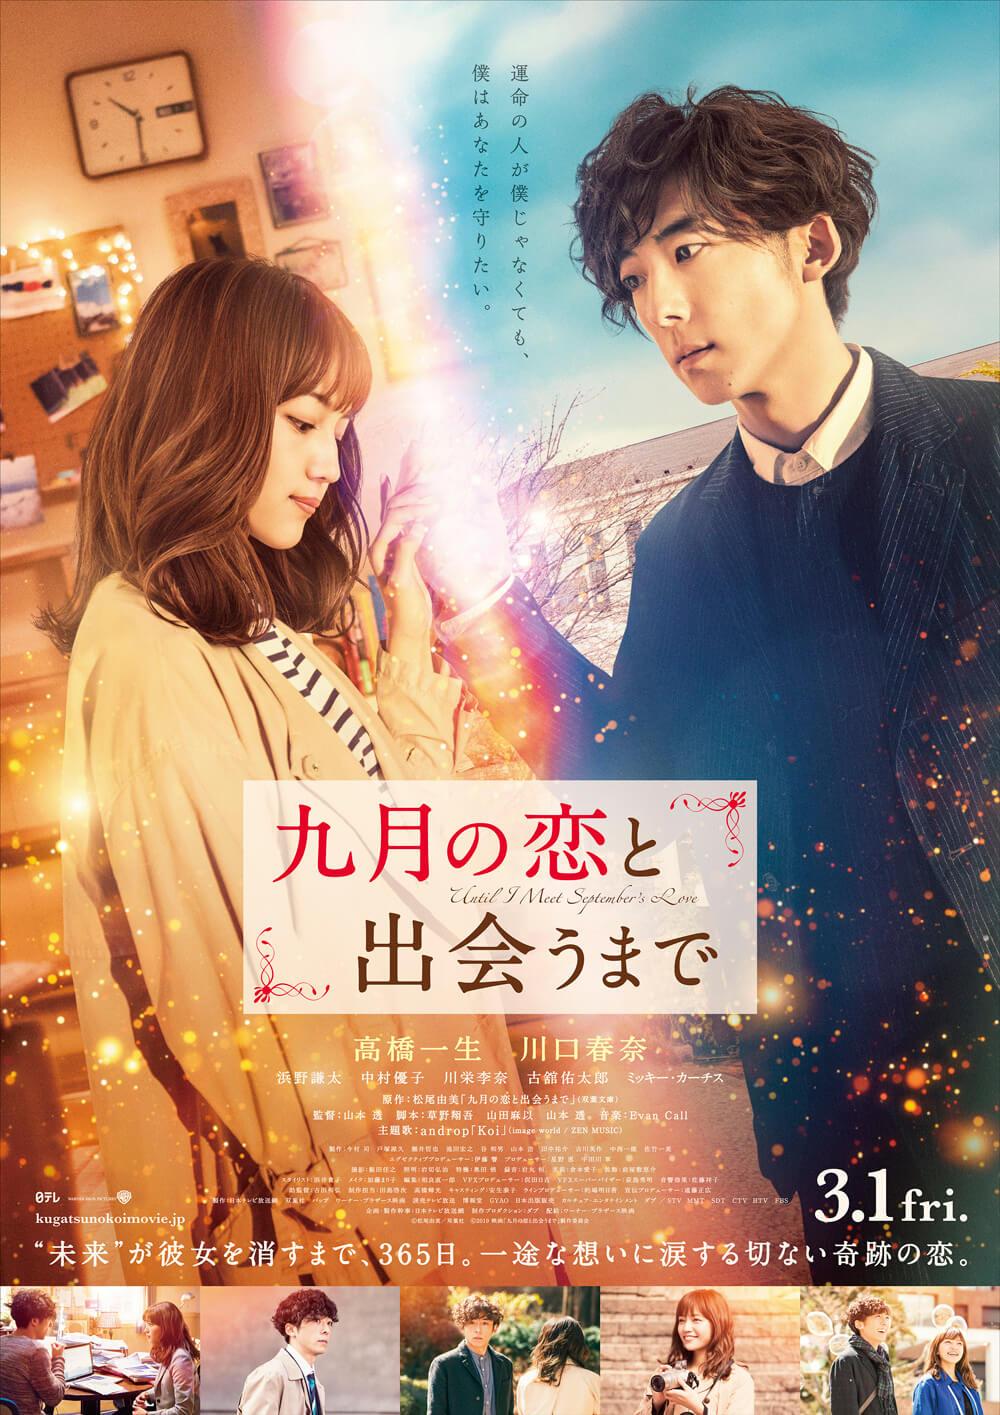 Sinopsis Until I Meet September's Love (2019) - Film Jepang